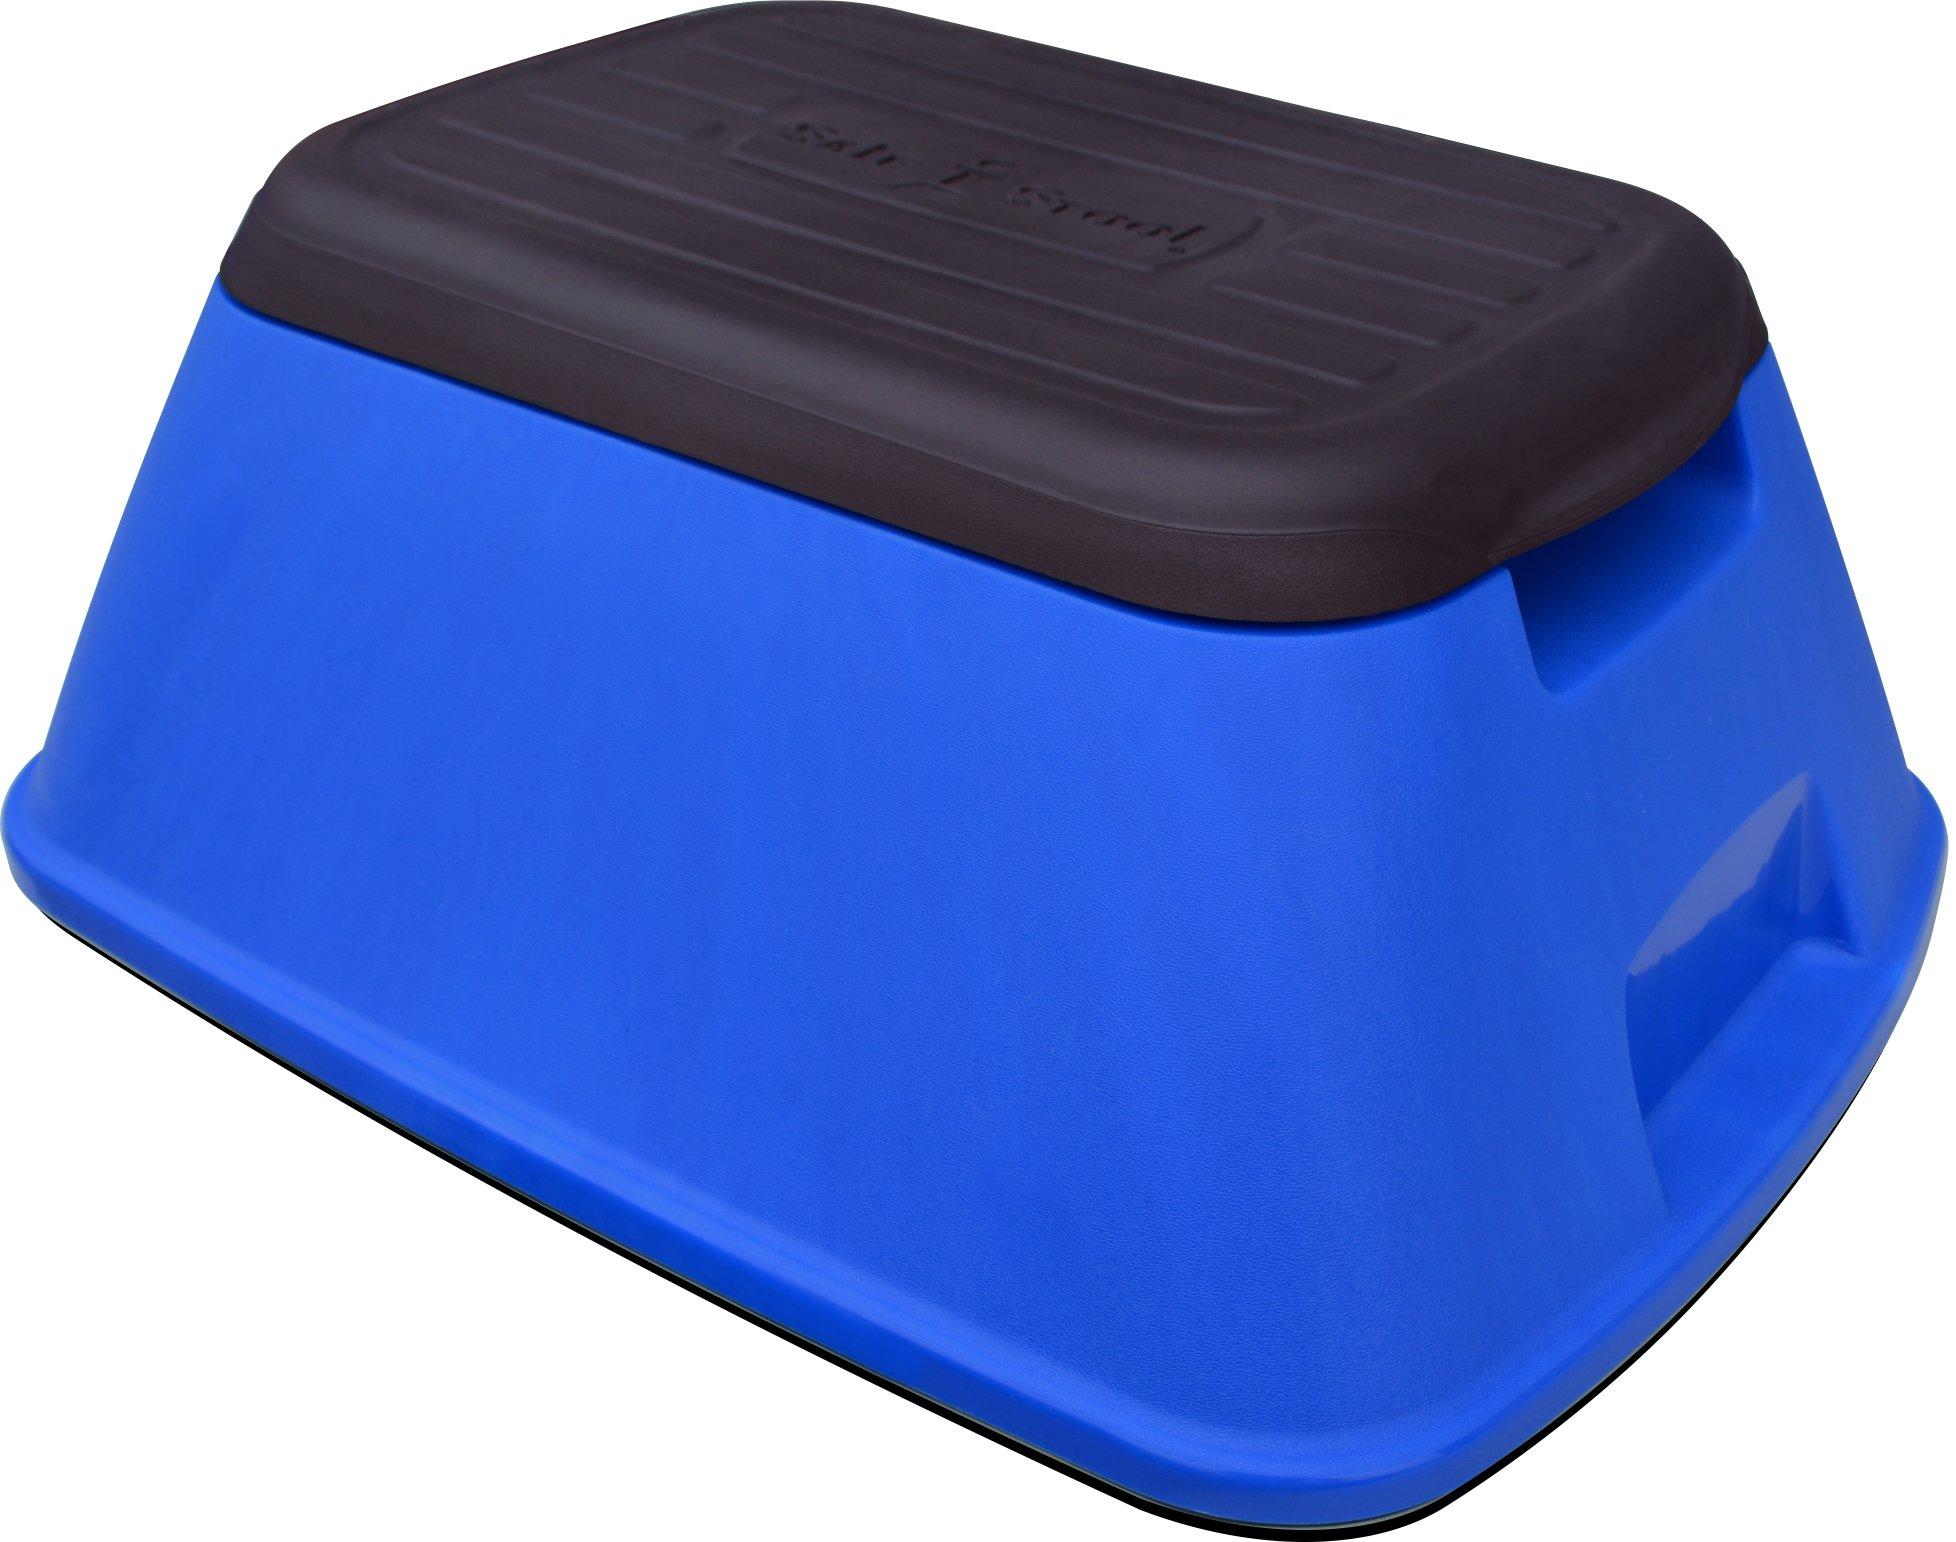 Safe-T-Stool the Safest, Most Versatile Stool in America (Matte Blue) by Safe-T-Stool (Image #1)